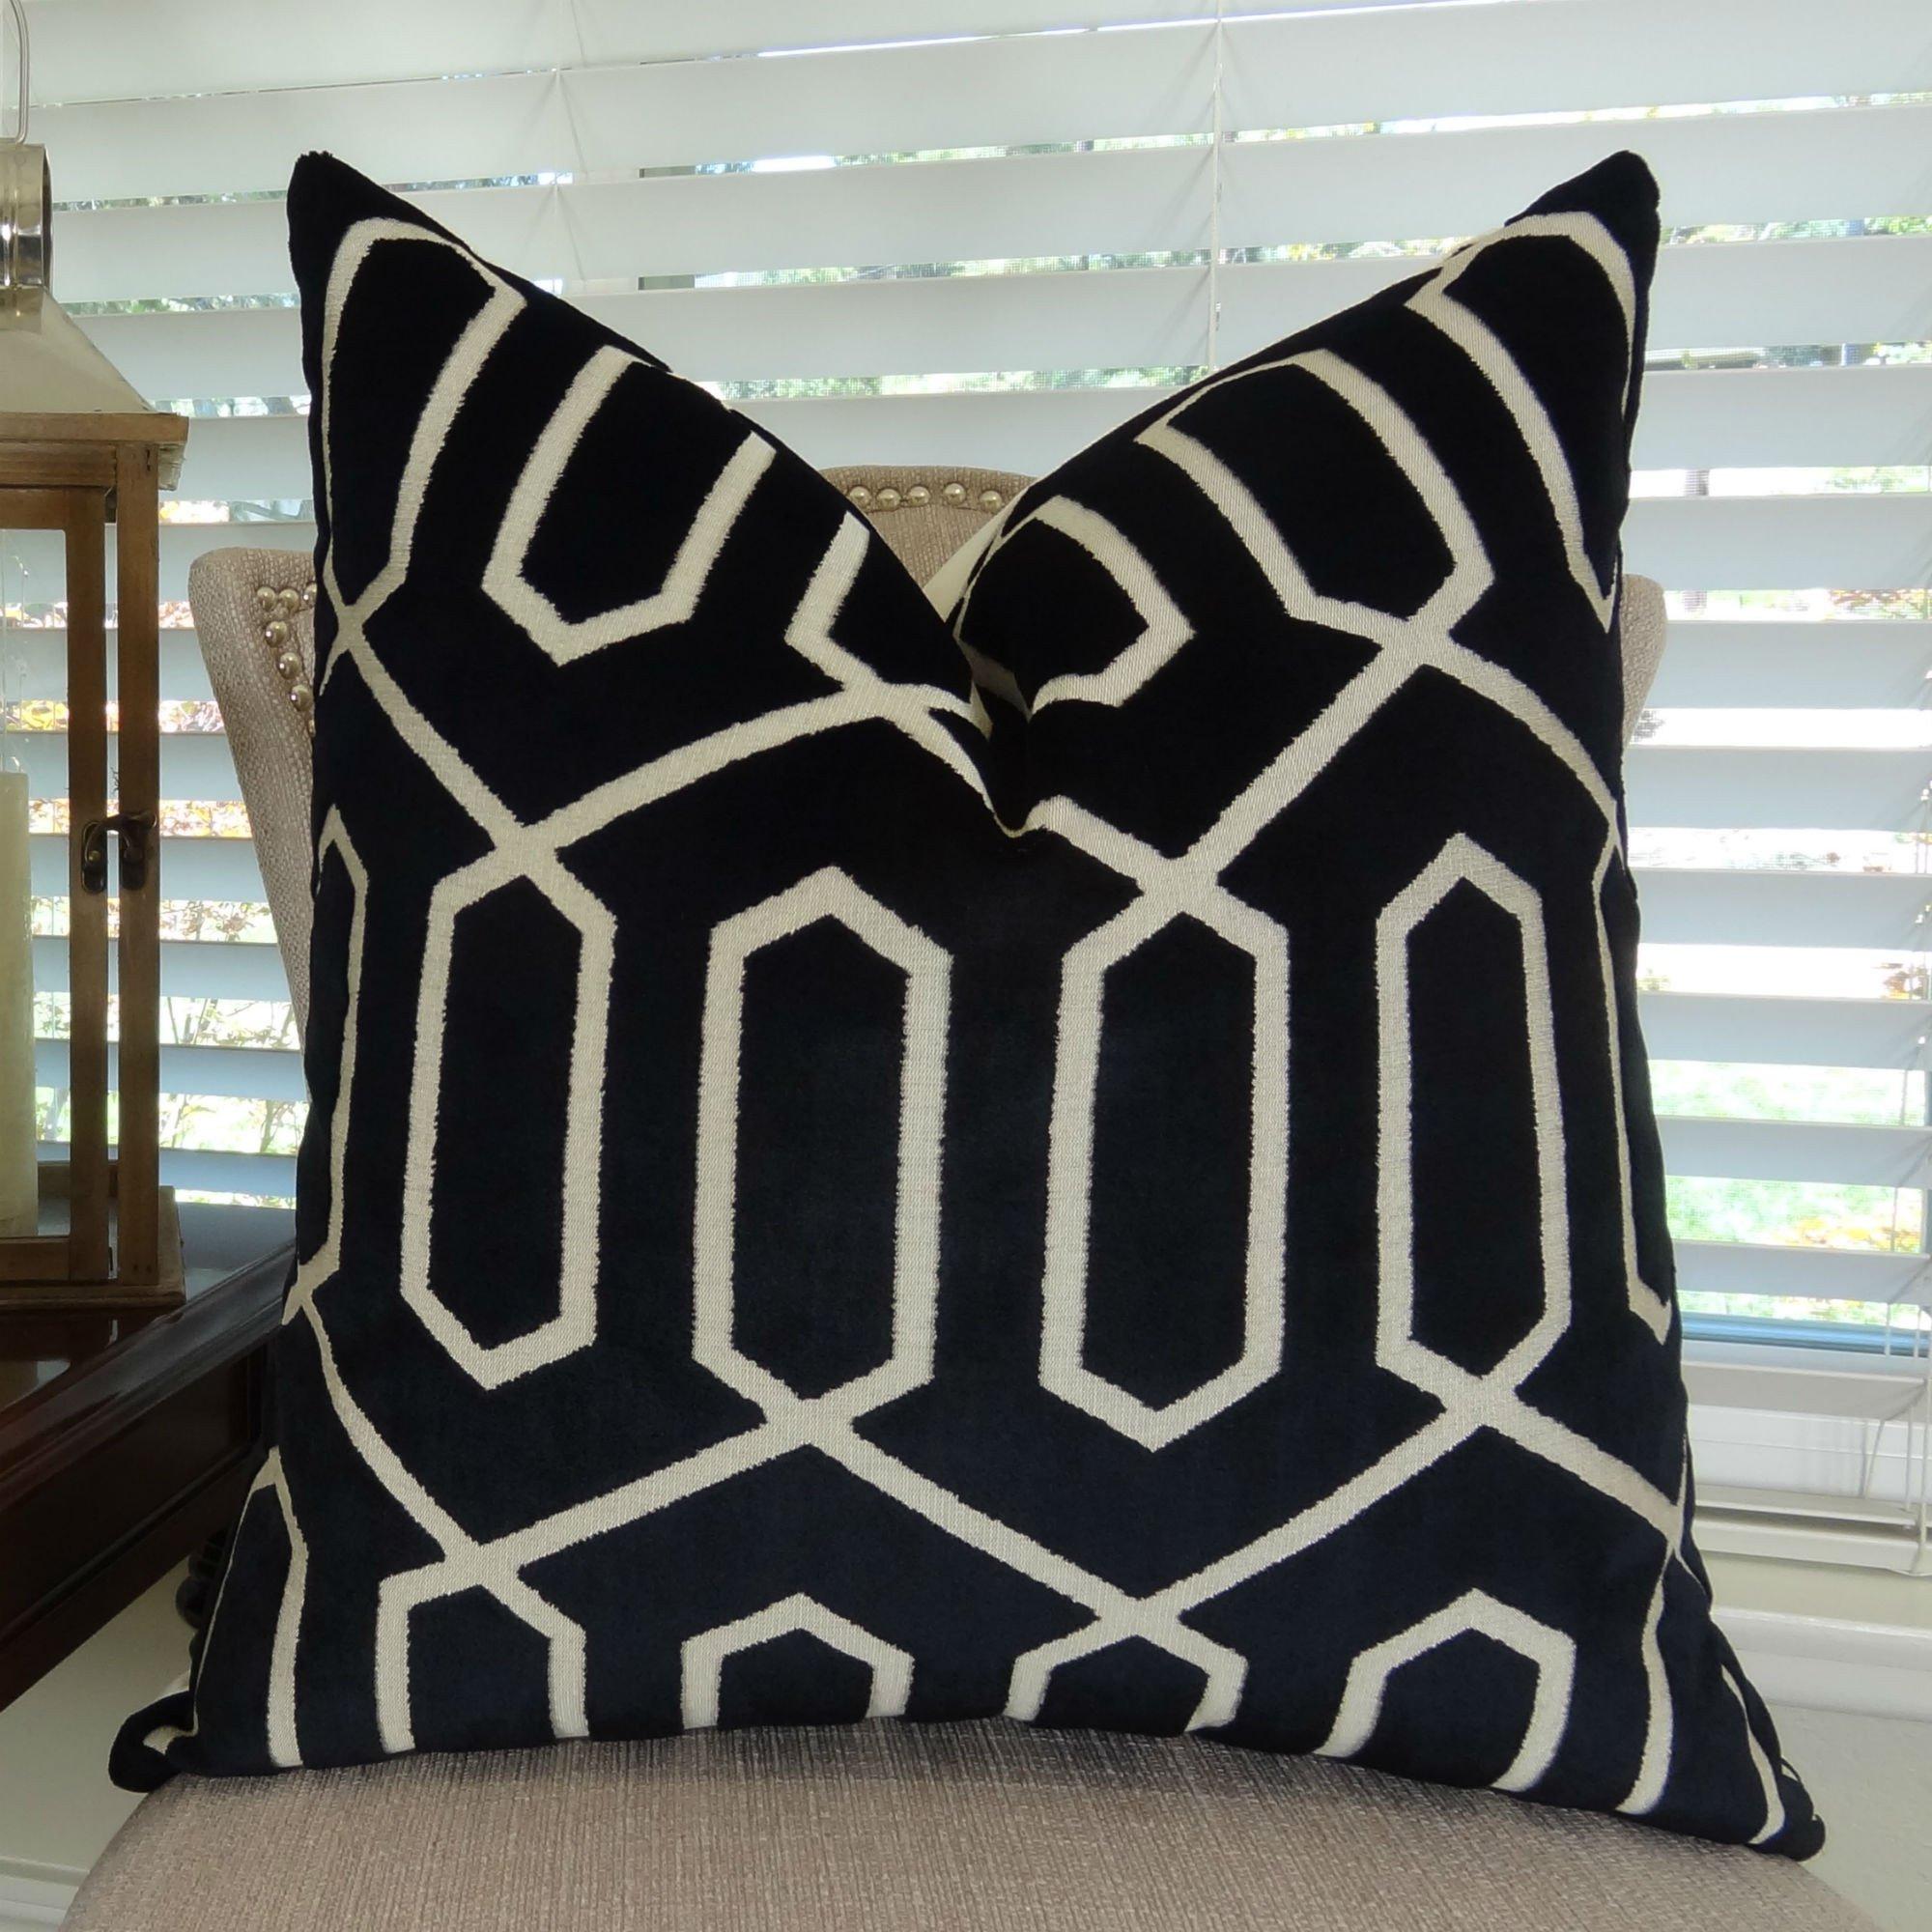 Thomas Collection handmade decorative pillows, sofa throw pillow, Black Velvet Luxury Throw Pillow, Taupe Geometric Key Trellis Designer Pillow, INCLUDES POLYFILL INSERT, Made in USA, 11388 by Thomas Collection